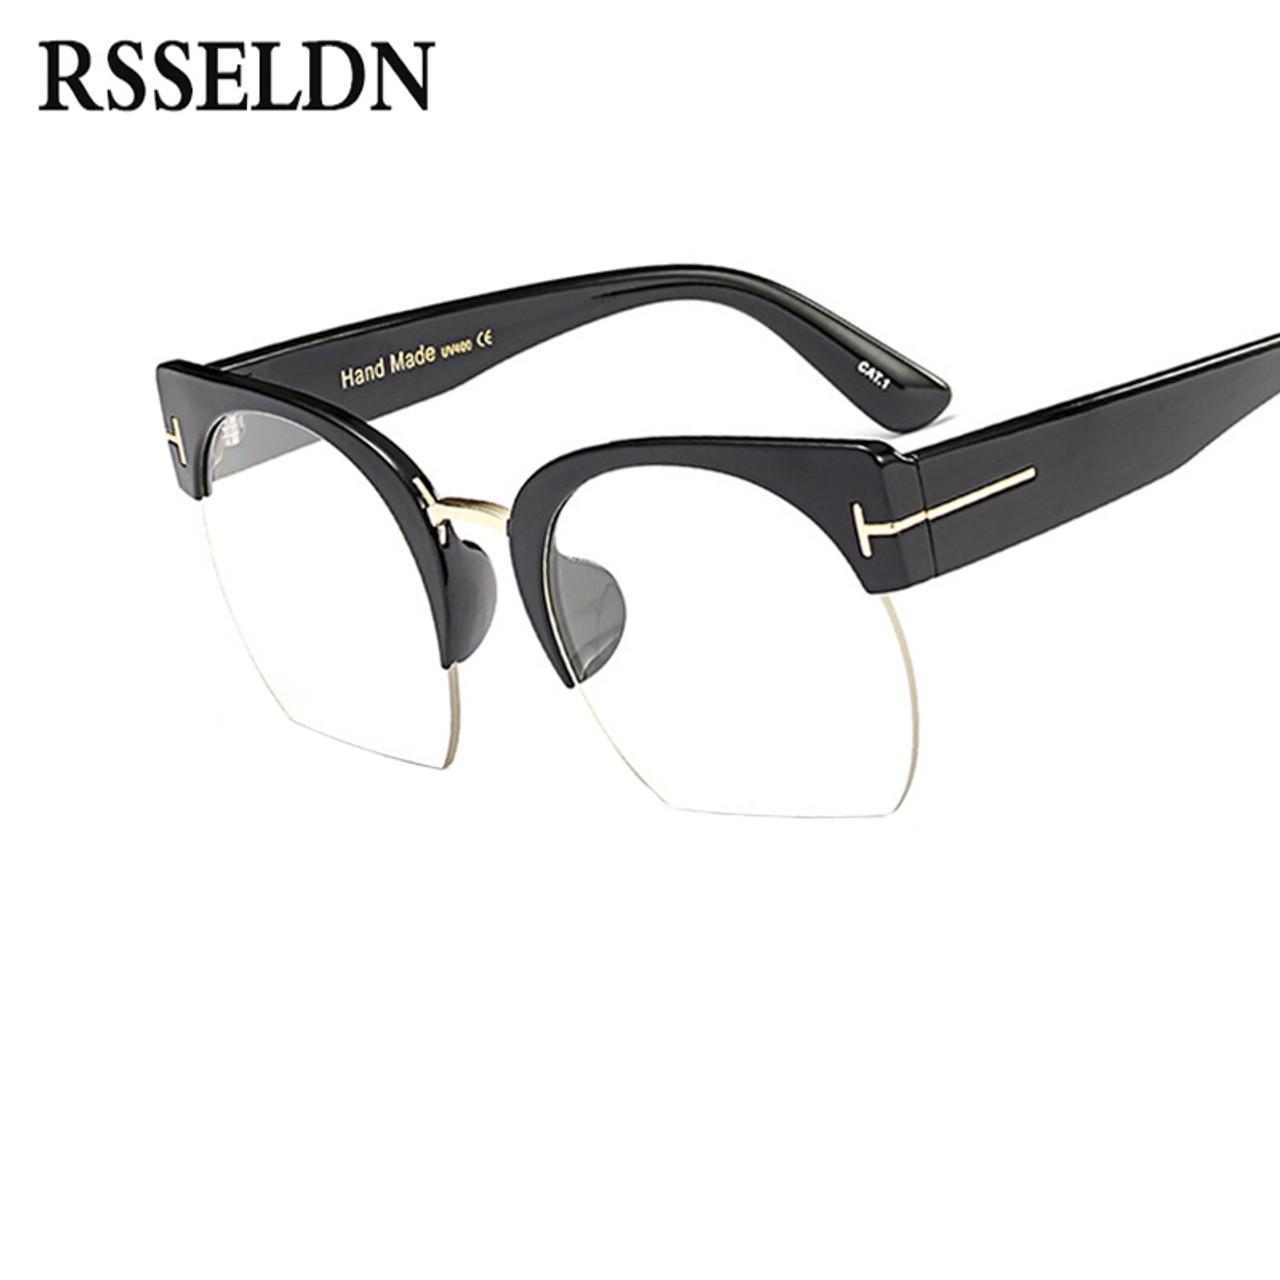 16cf307c029 ... RSSELDN Newest Semi-Rimless Sunglasses Women Brand Designer Clear Lens  Sun Glasses For Women Fashion ...